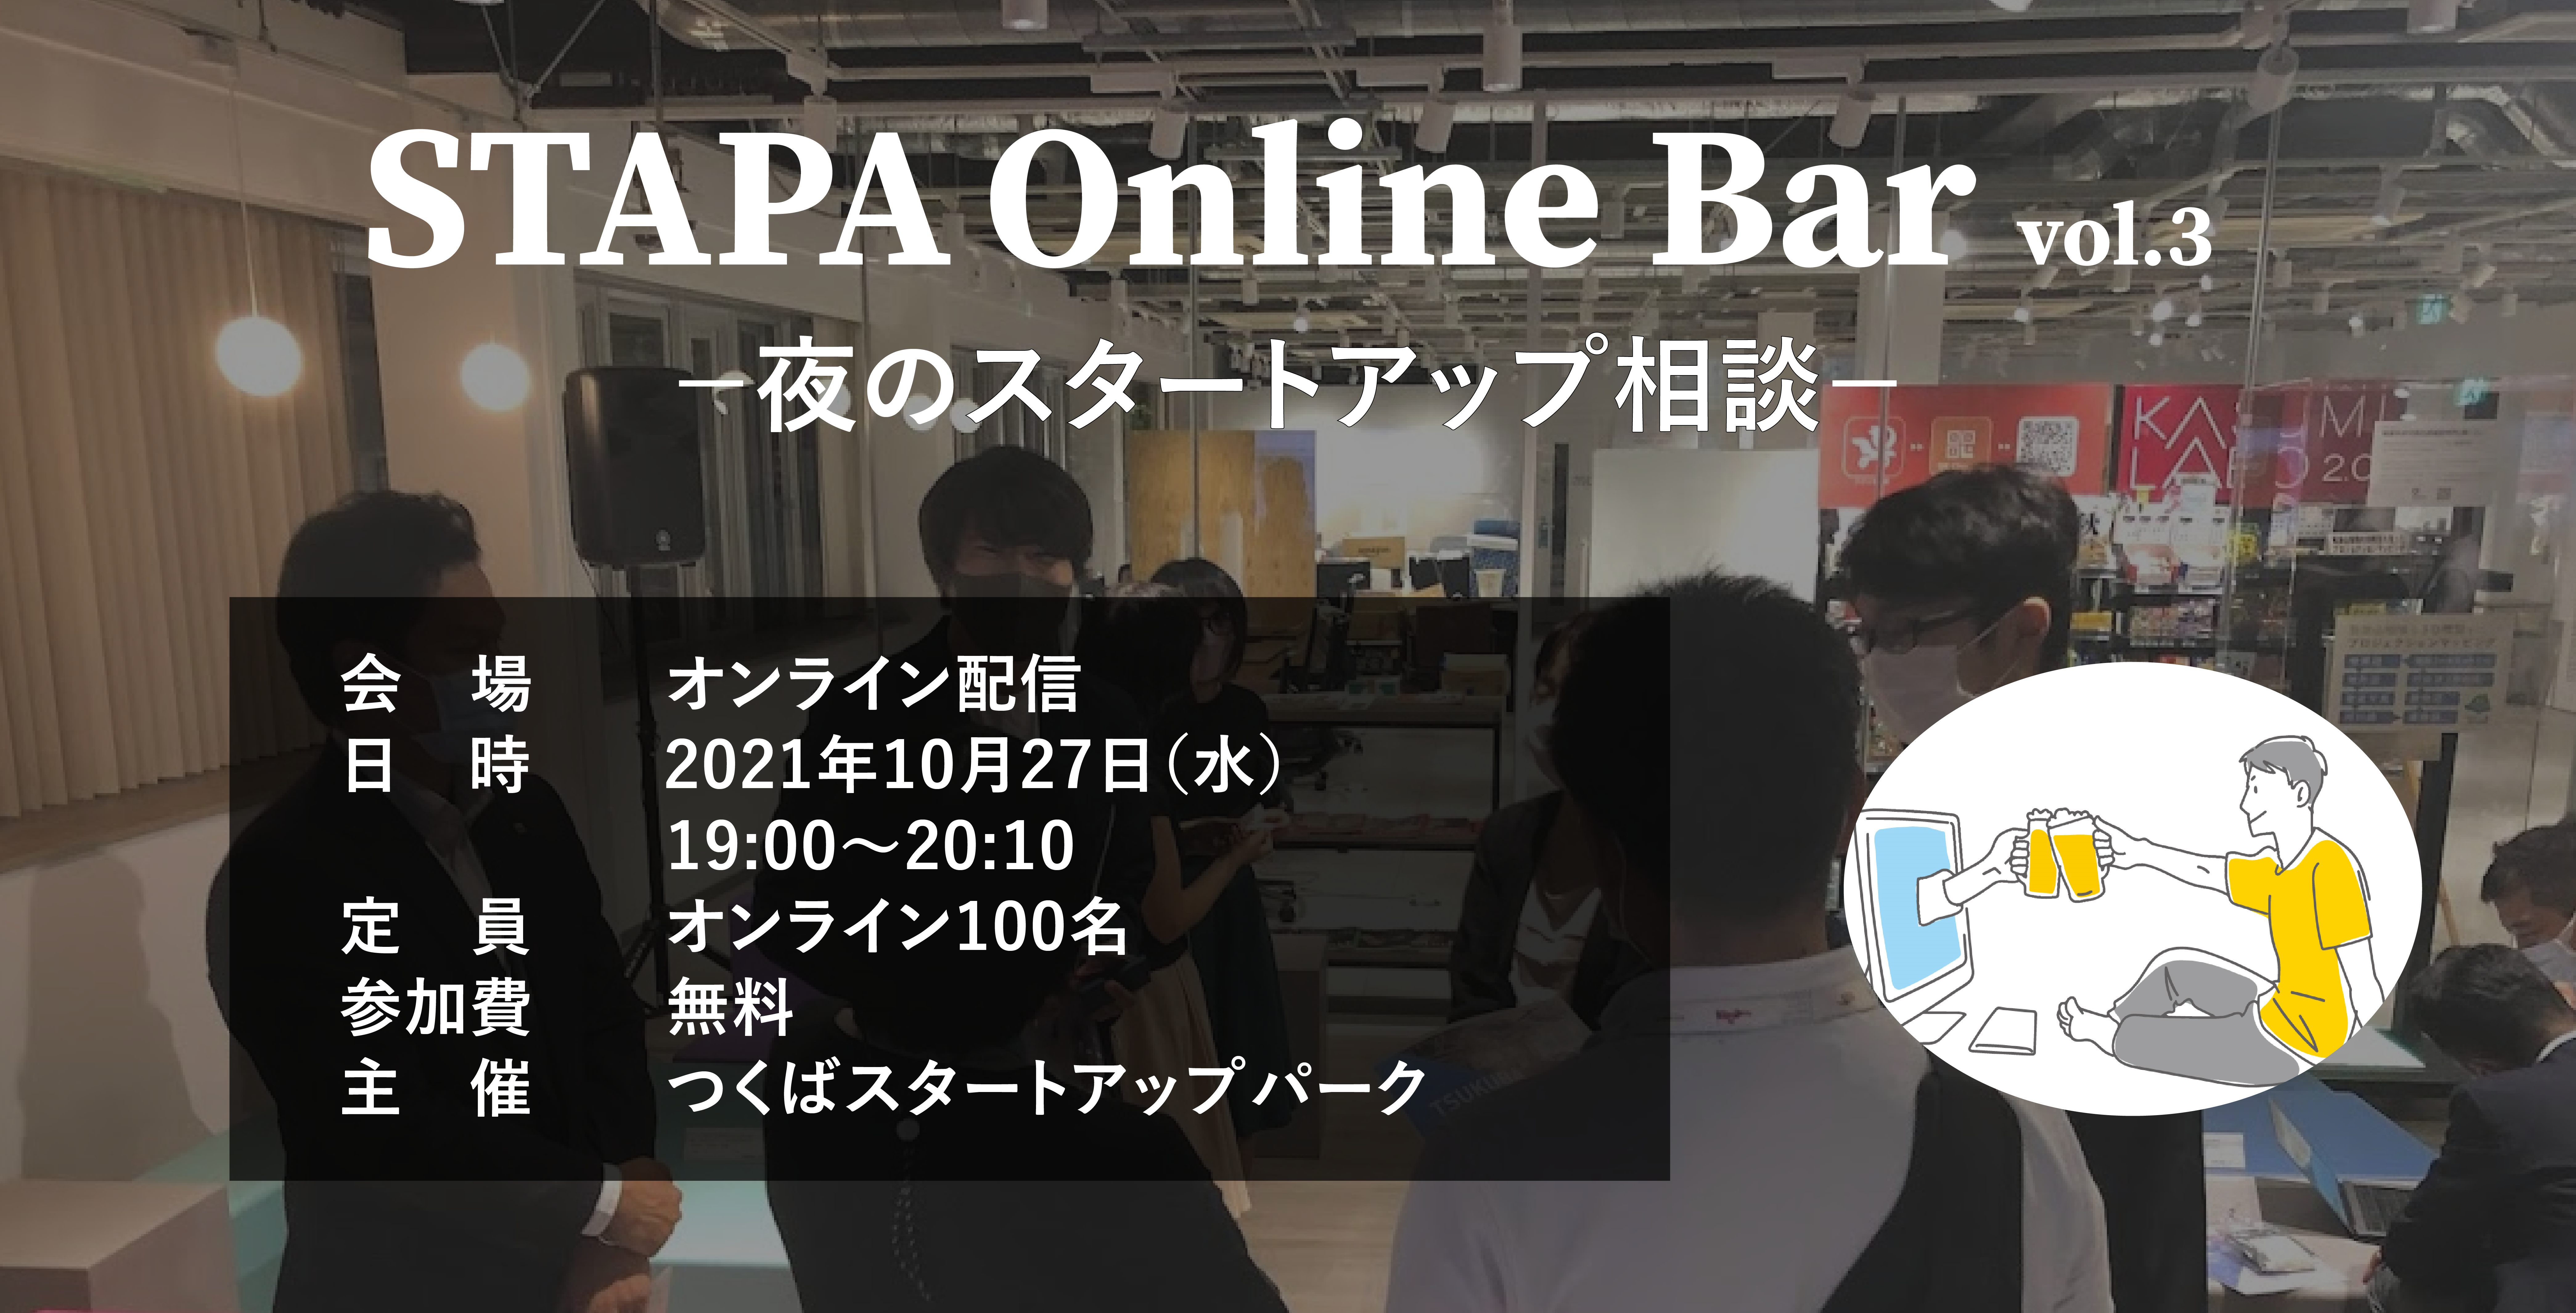 STAPA Online Bar vol.3 -夜のスタートアップ相談-